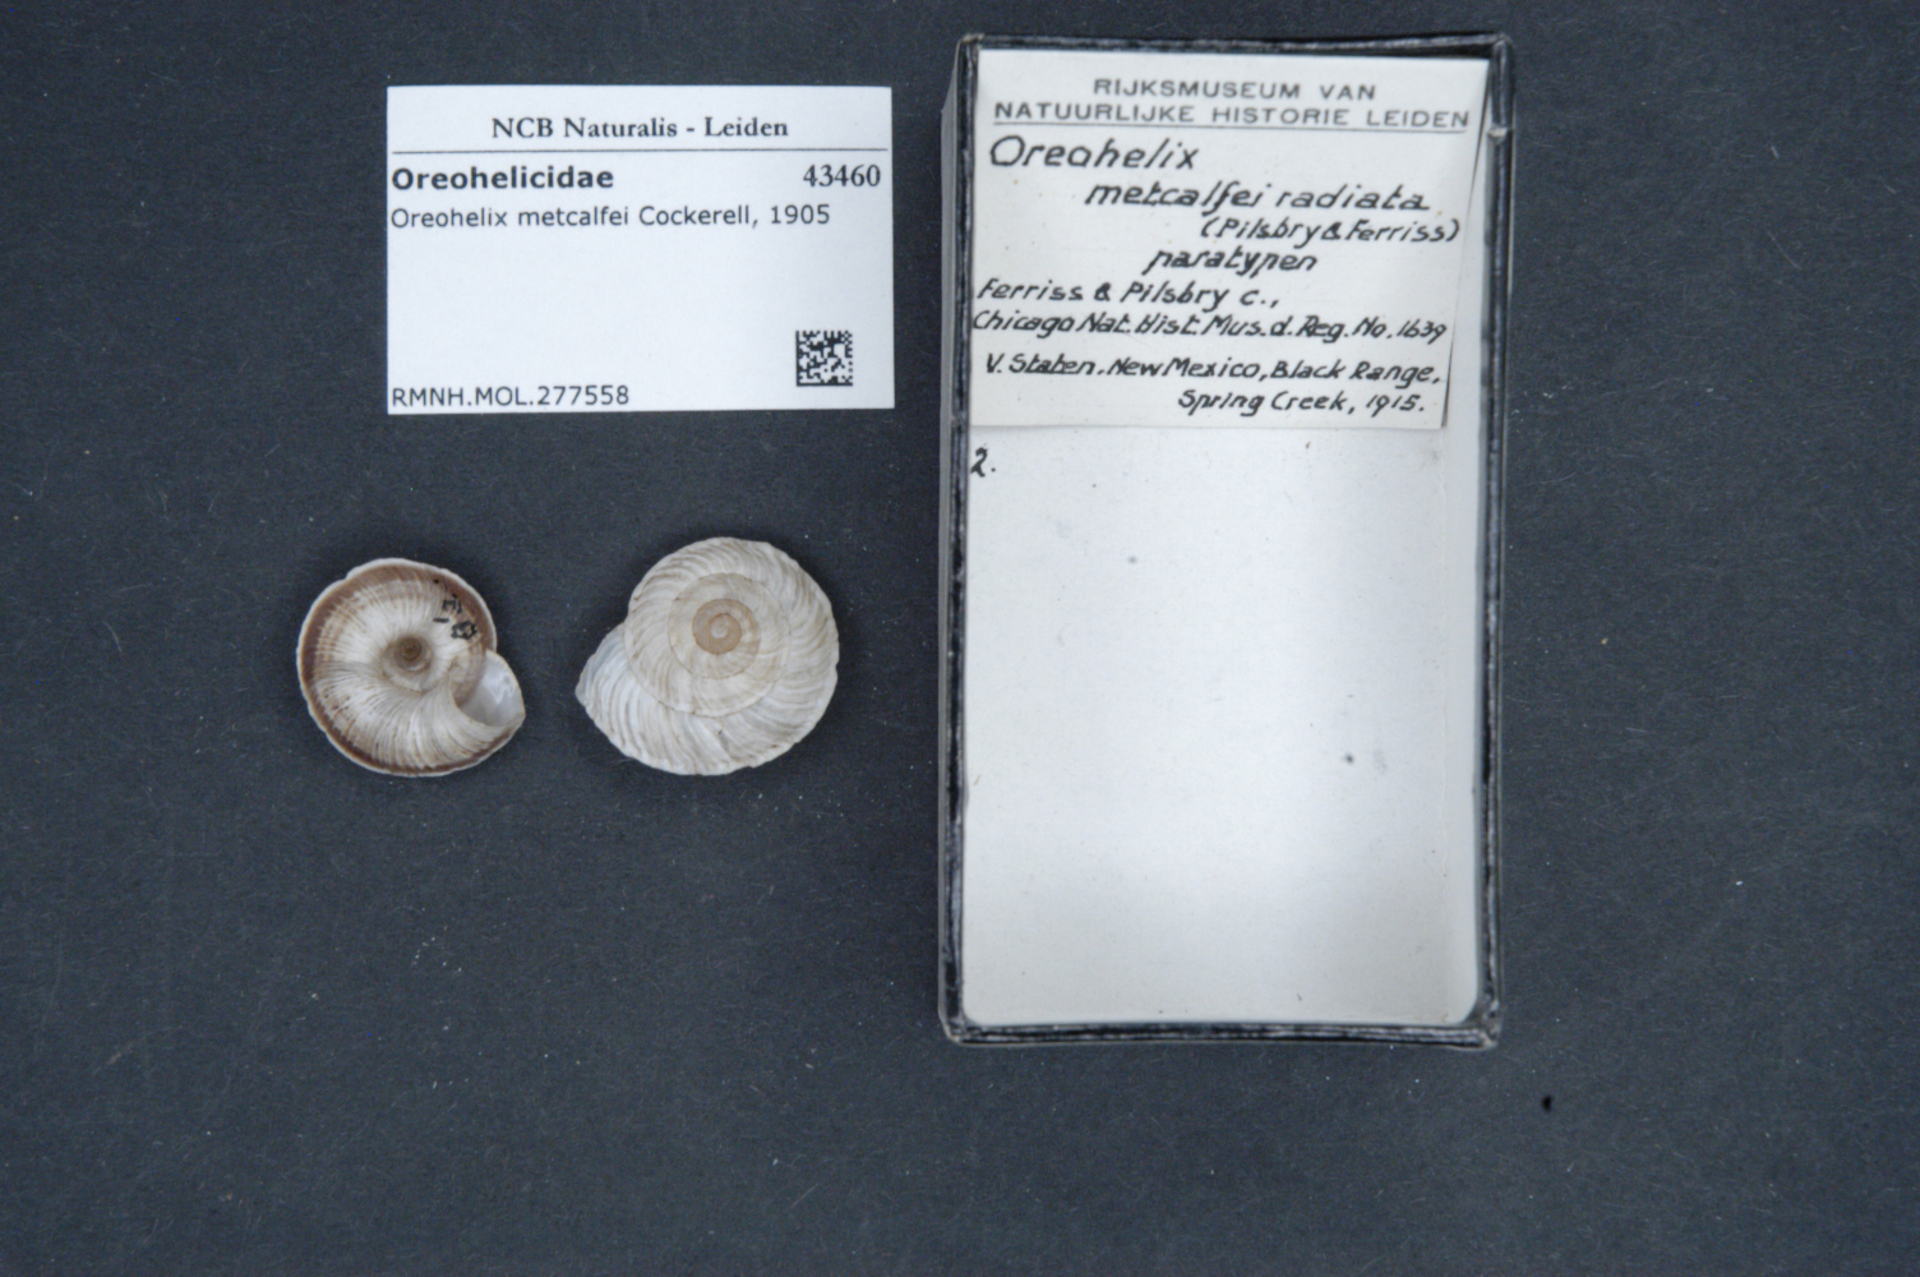 RMNH.MOL.277558 | Oreohelix metcalfei radiata Pilsbry & Ferriss, 1917